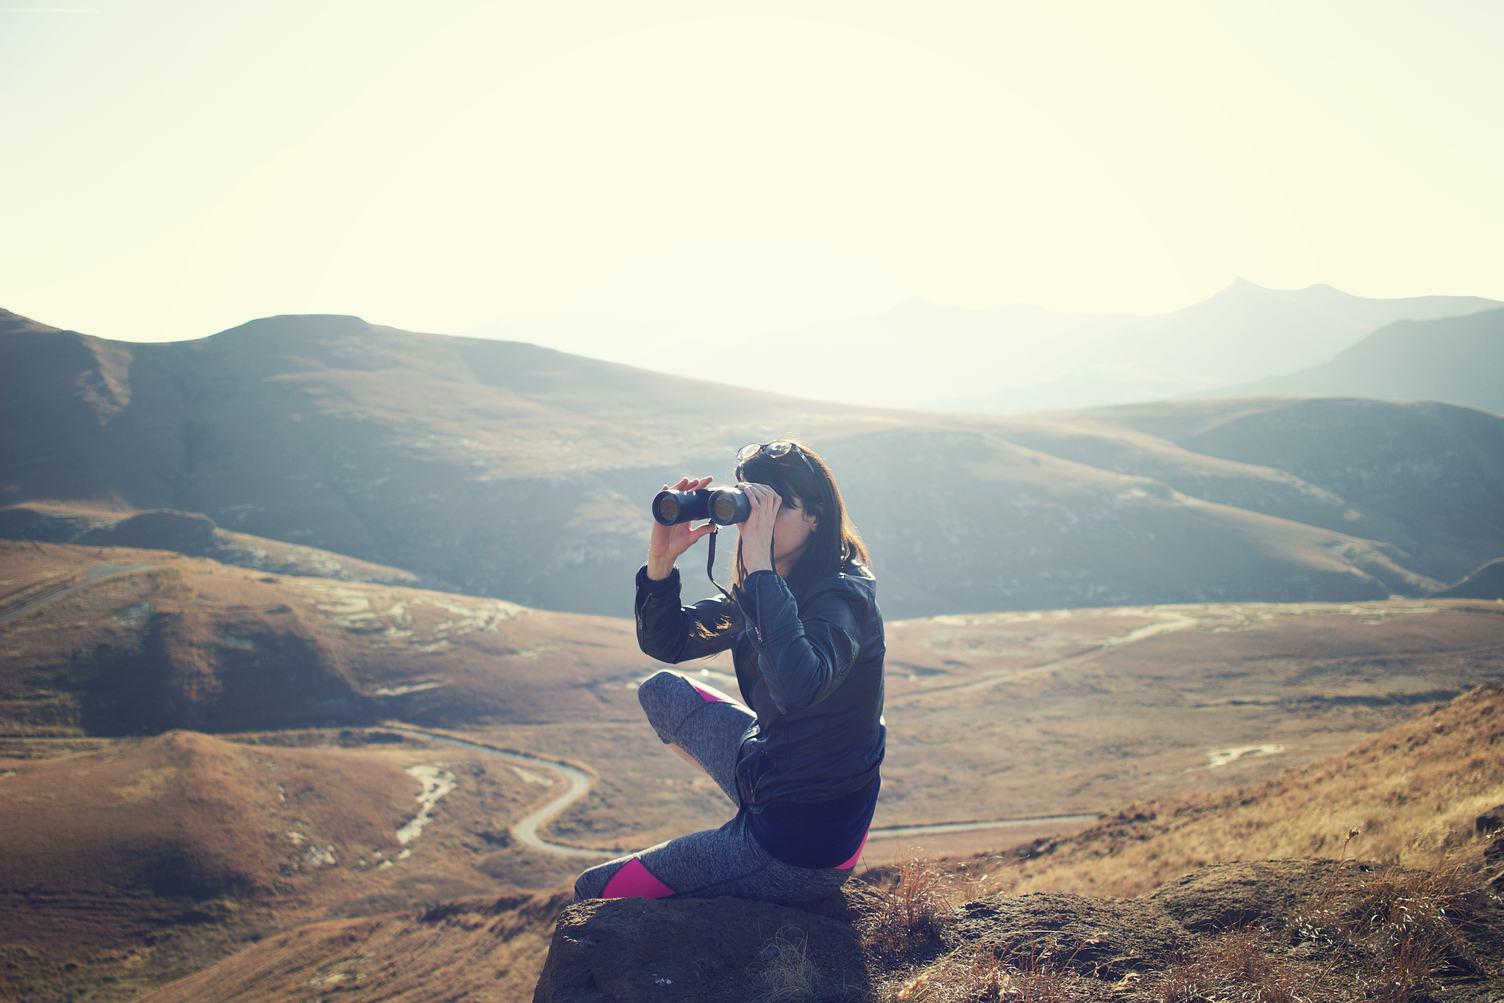 Girl Looking through Binoculars in the Mountains